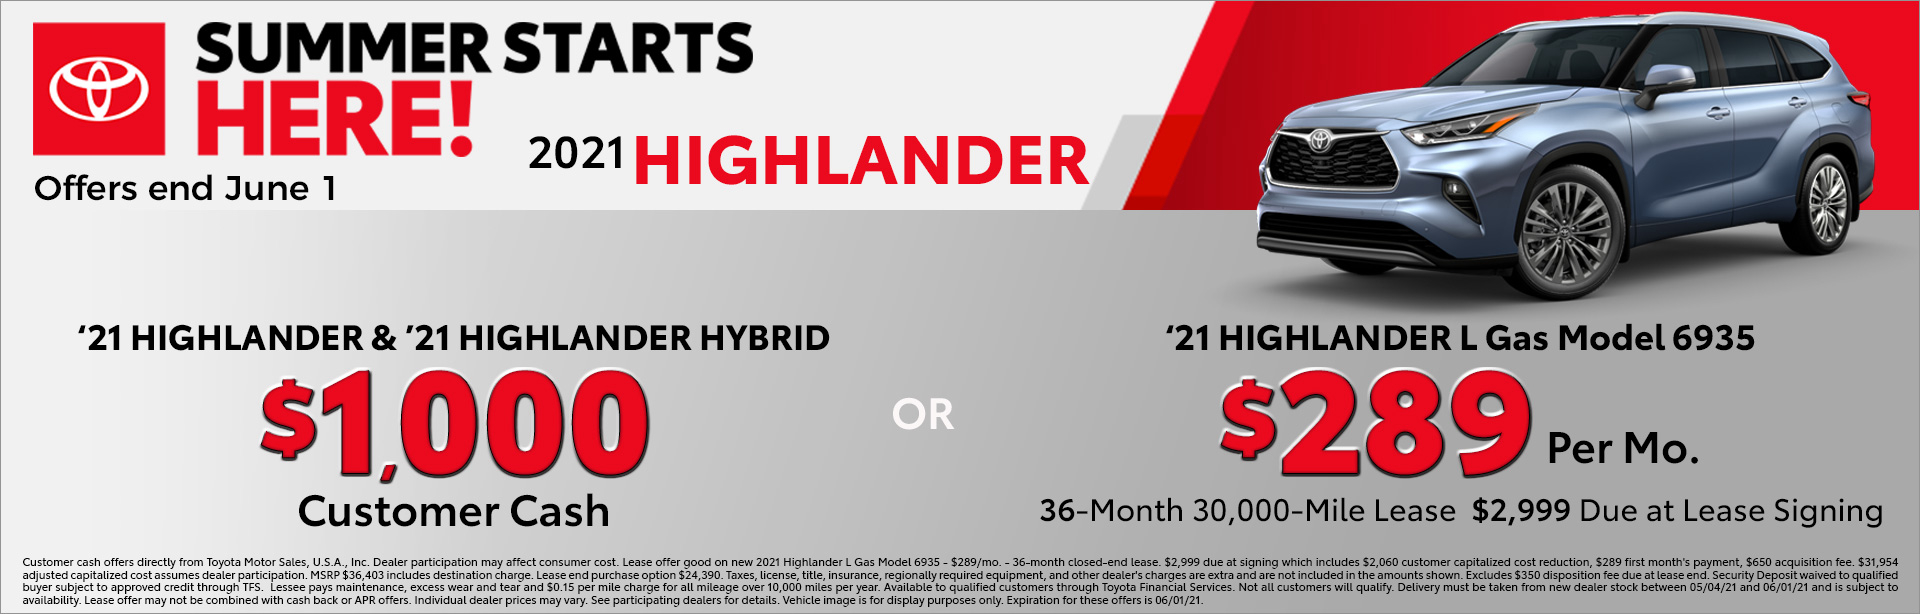 05-21_01_Cincinnati-May-2021-CIN-Summer-Starts-Here-Highlander-_1920x614_daf5_Highlander-Highlander-Hybrid_O_xta.jpeg